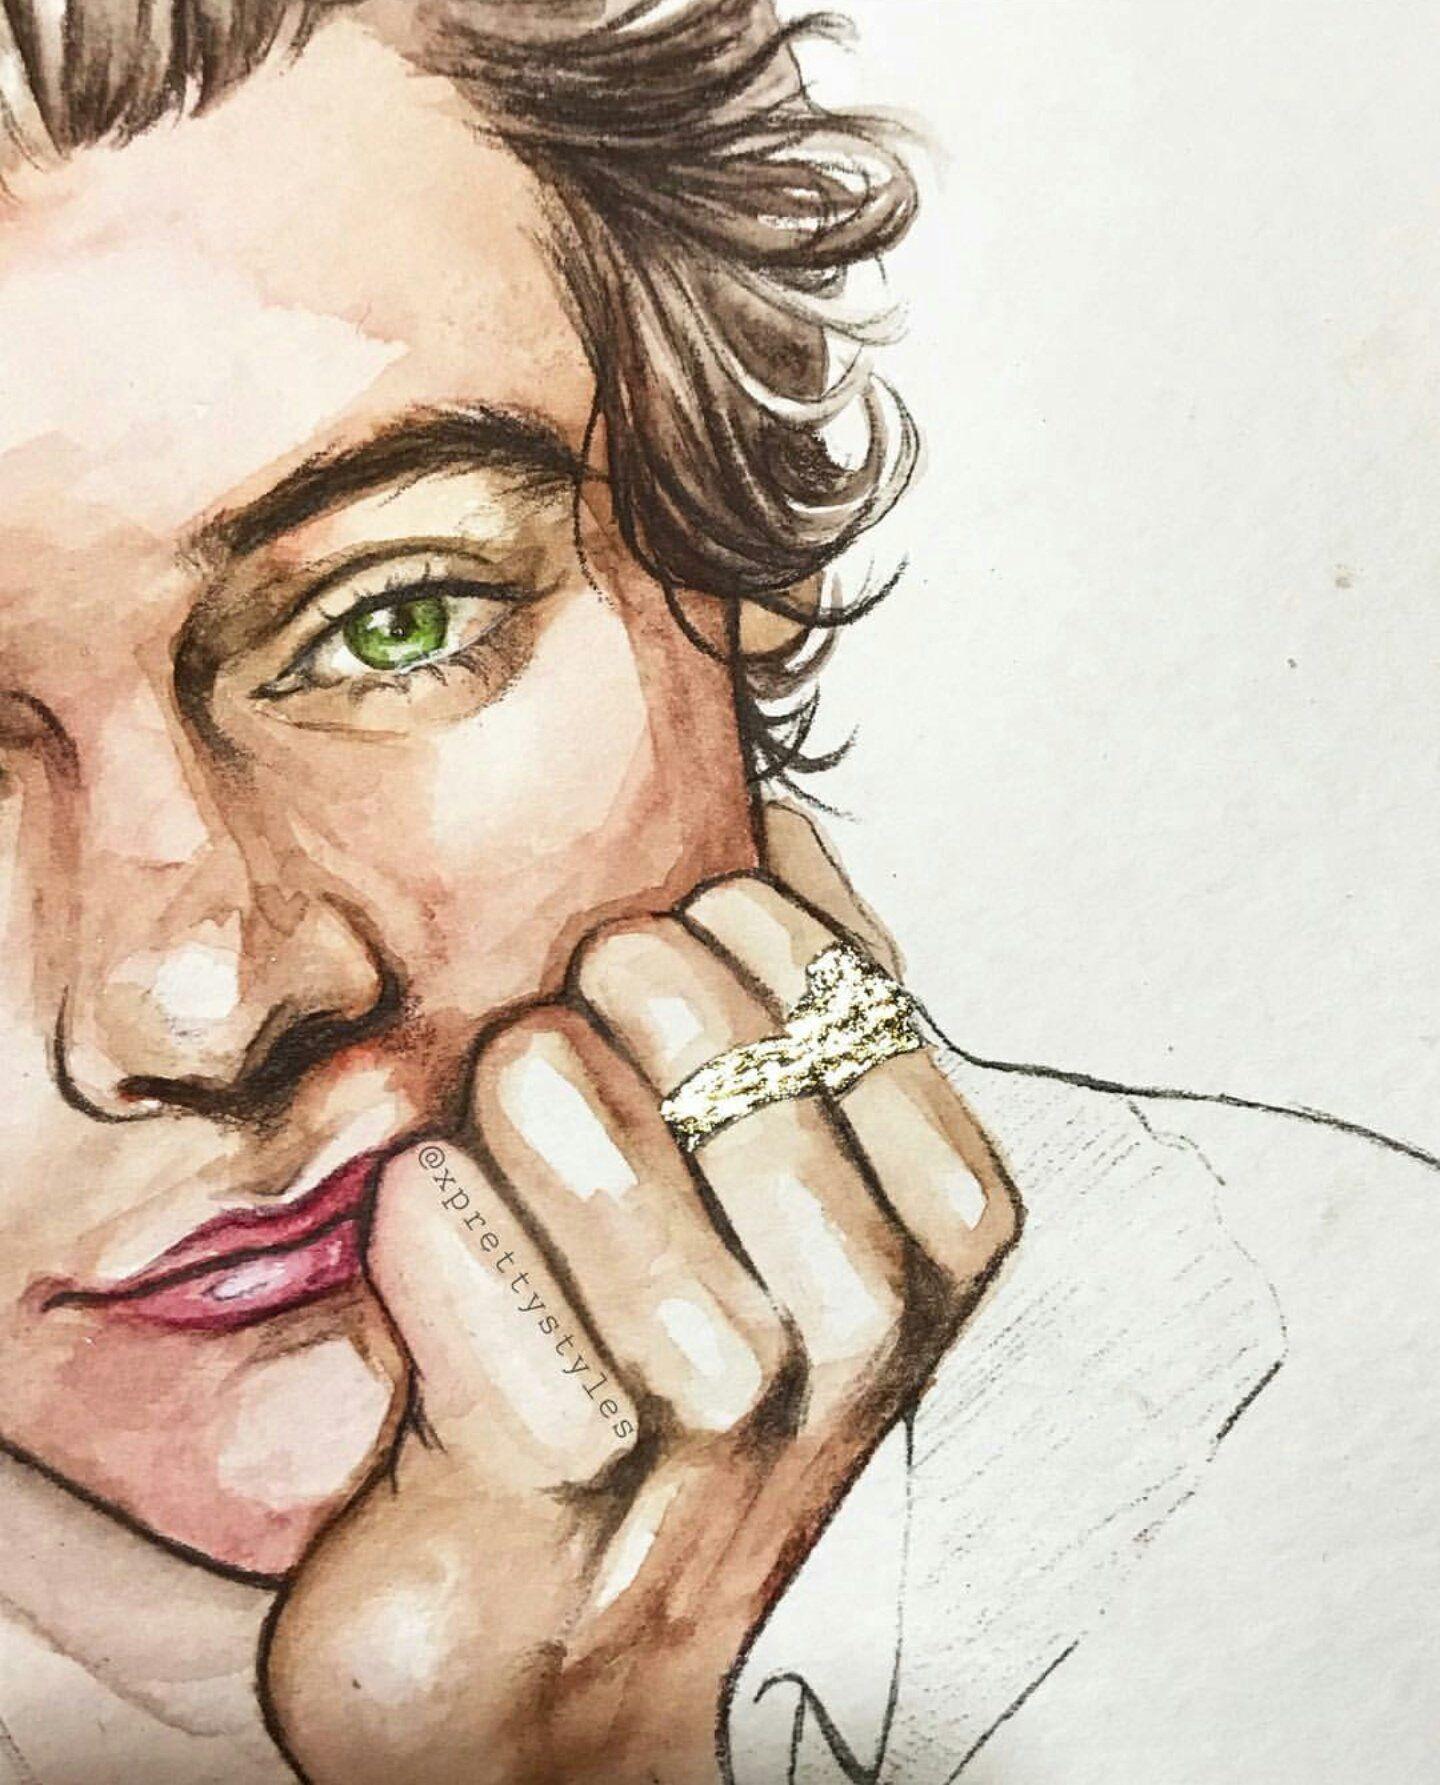 Pin De Lucia Lazaro Gomez En 1d Art Dibujos De Famosos Dibujos De One Direction Arte De Sueños